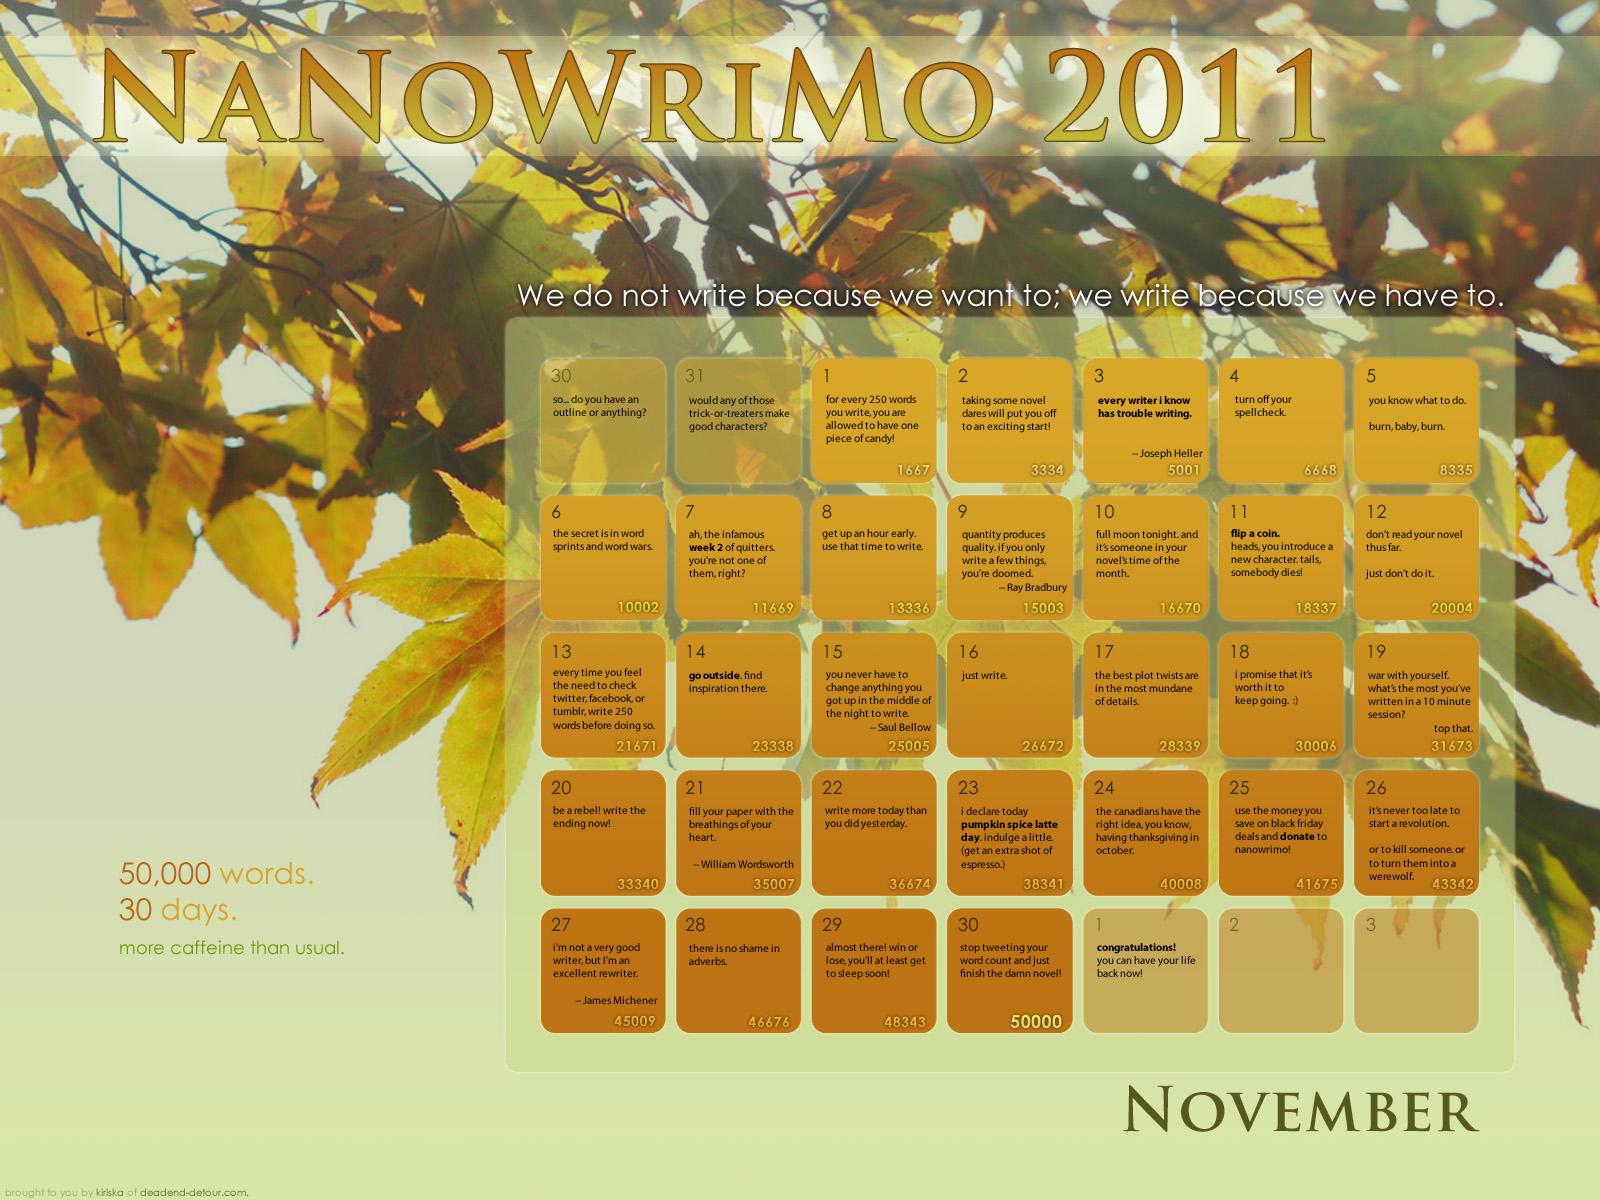 http://4.bp.blogspot.com/-l2NAimmh19E/TpUnP0cYe6I/AAAAAAAAARM/s5u_obrYMQs/s1600/nanowrimo_2011_calendar_by_kiriska-d4c3lzj.jpg